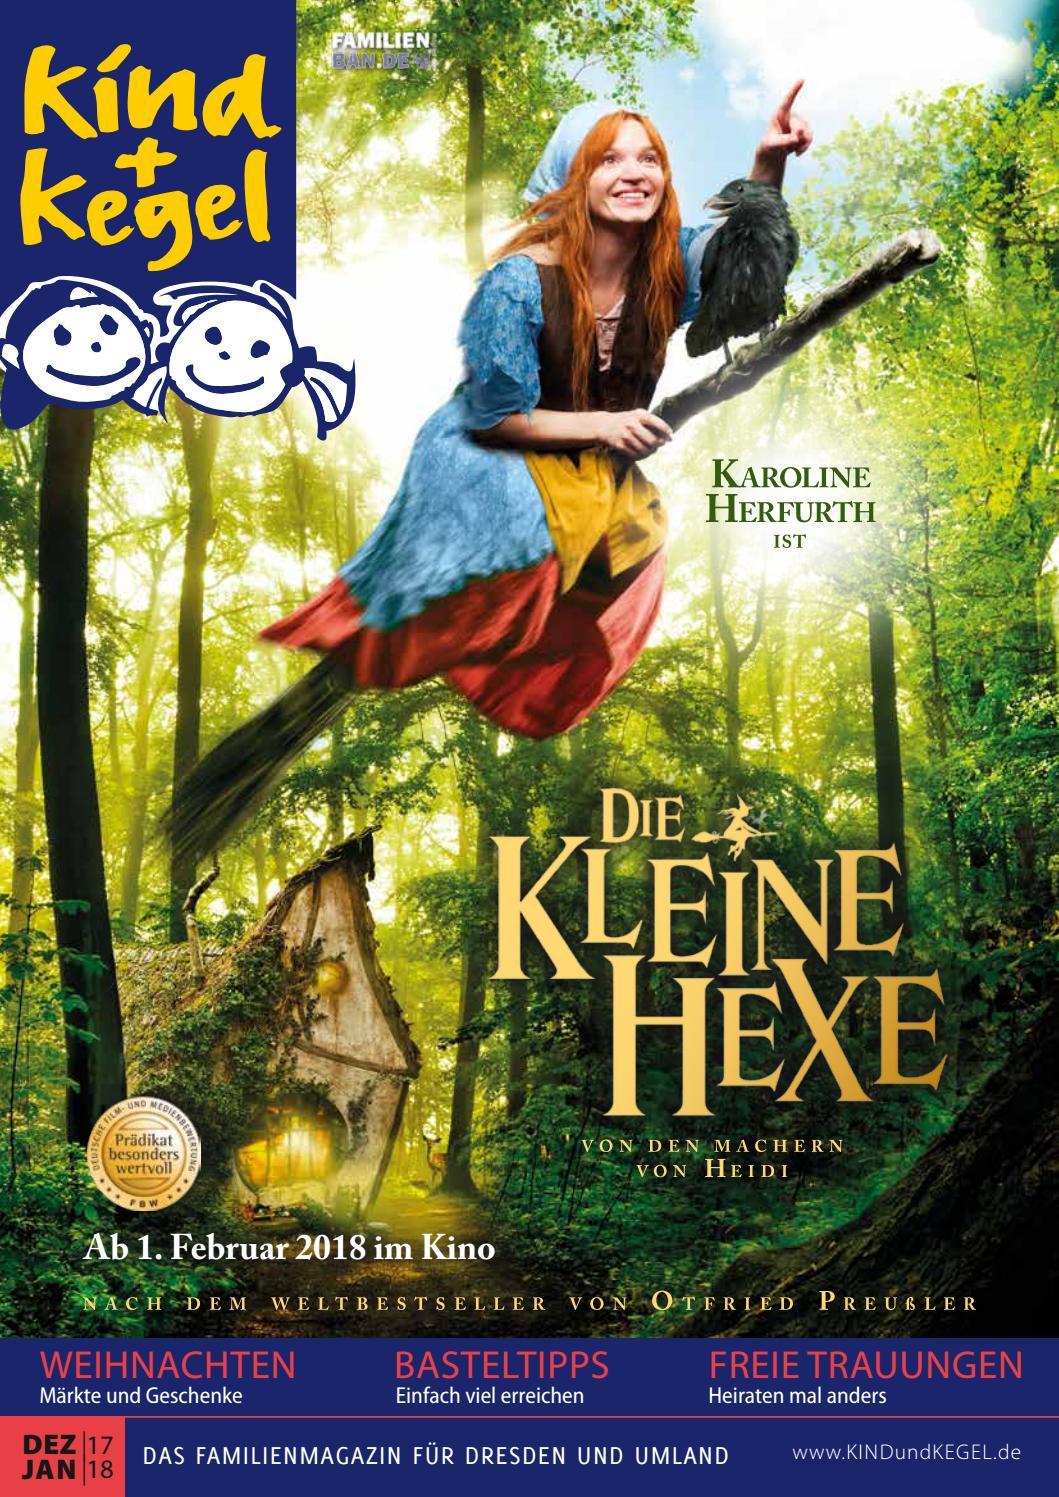 Kk ausgabe 12 2017 by KindundKegel issuu